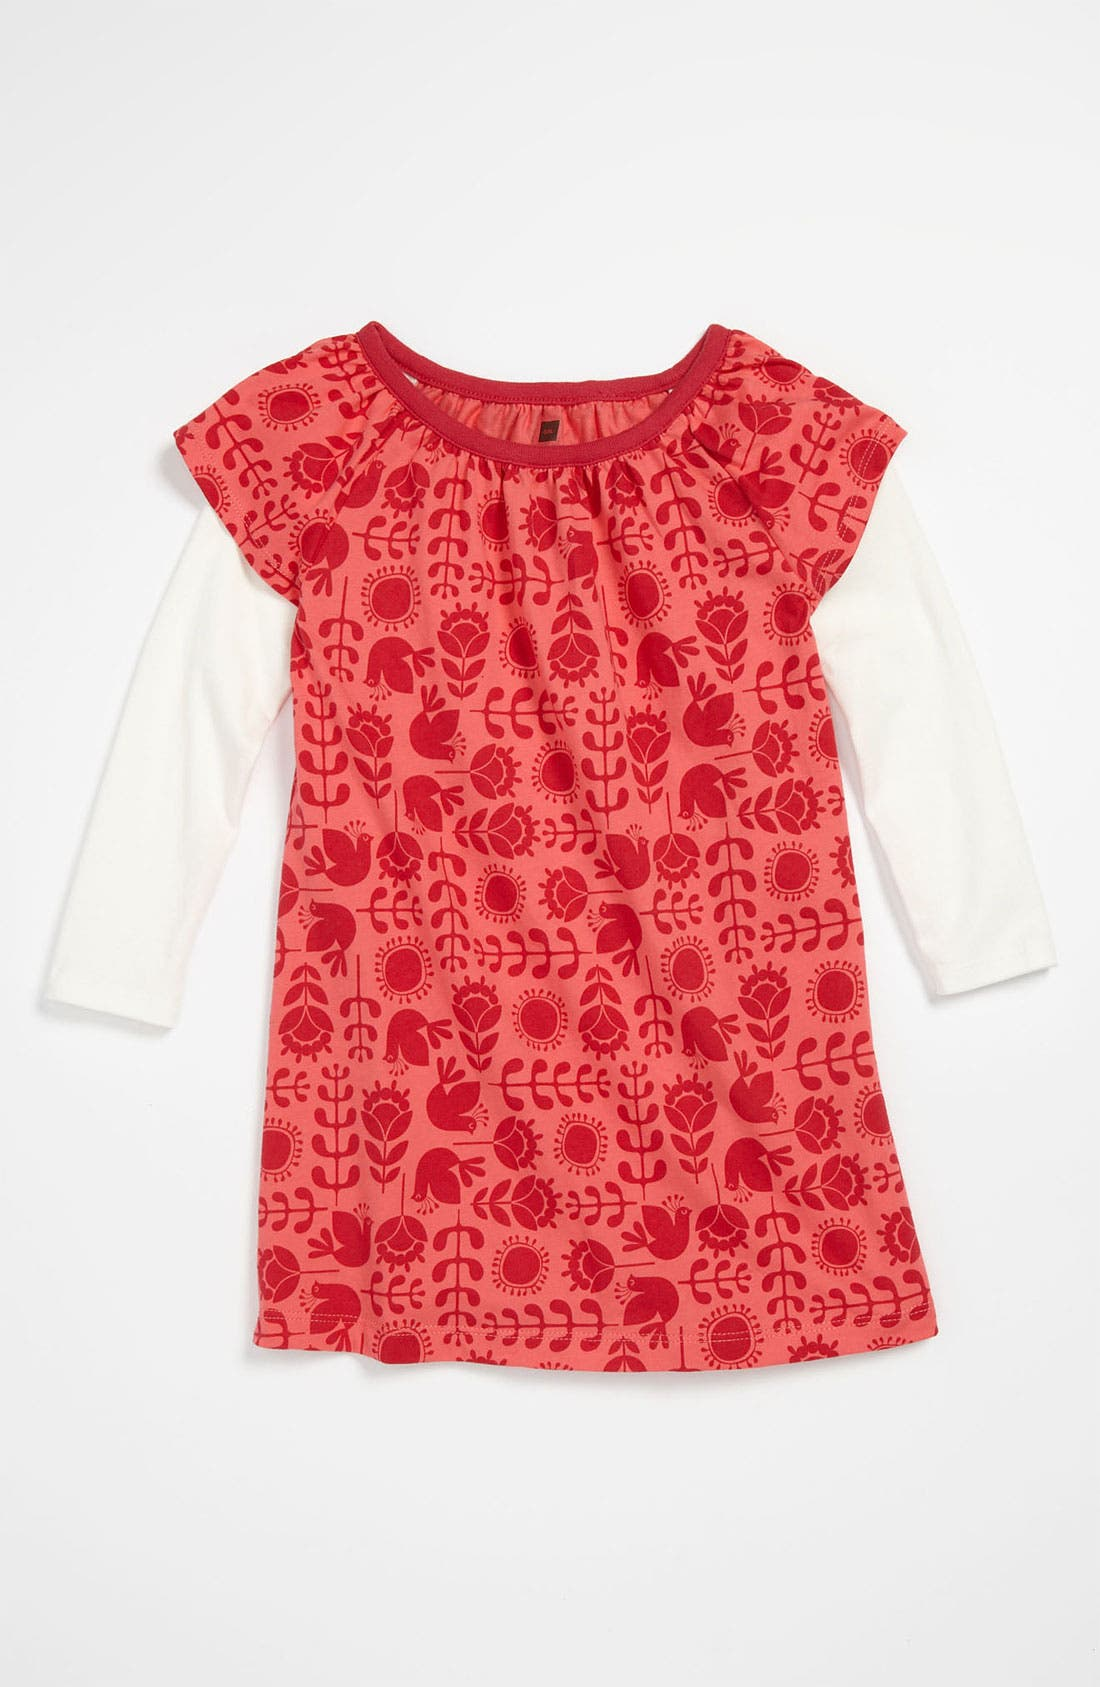 Alternate Image 1 Selected - Tea Collection 'Swedish Lark' Dress (Infant)